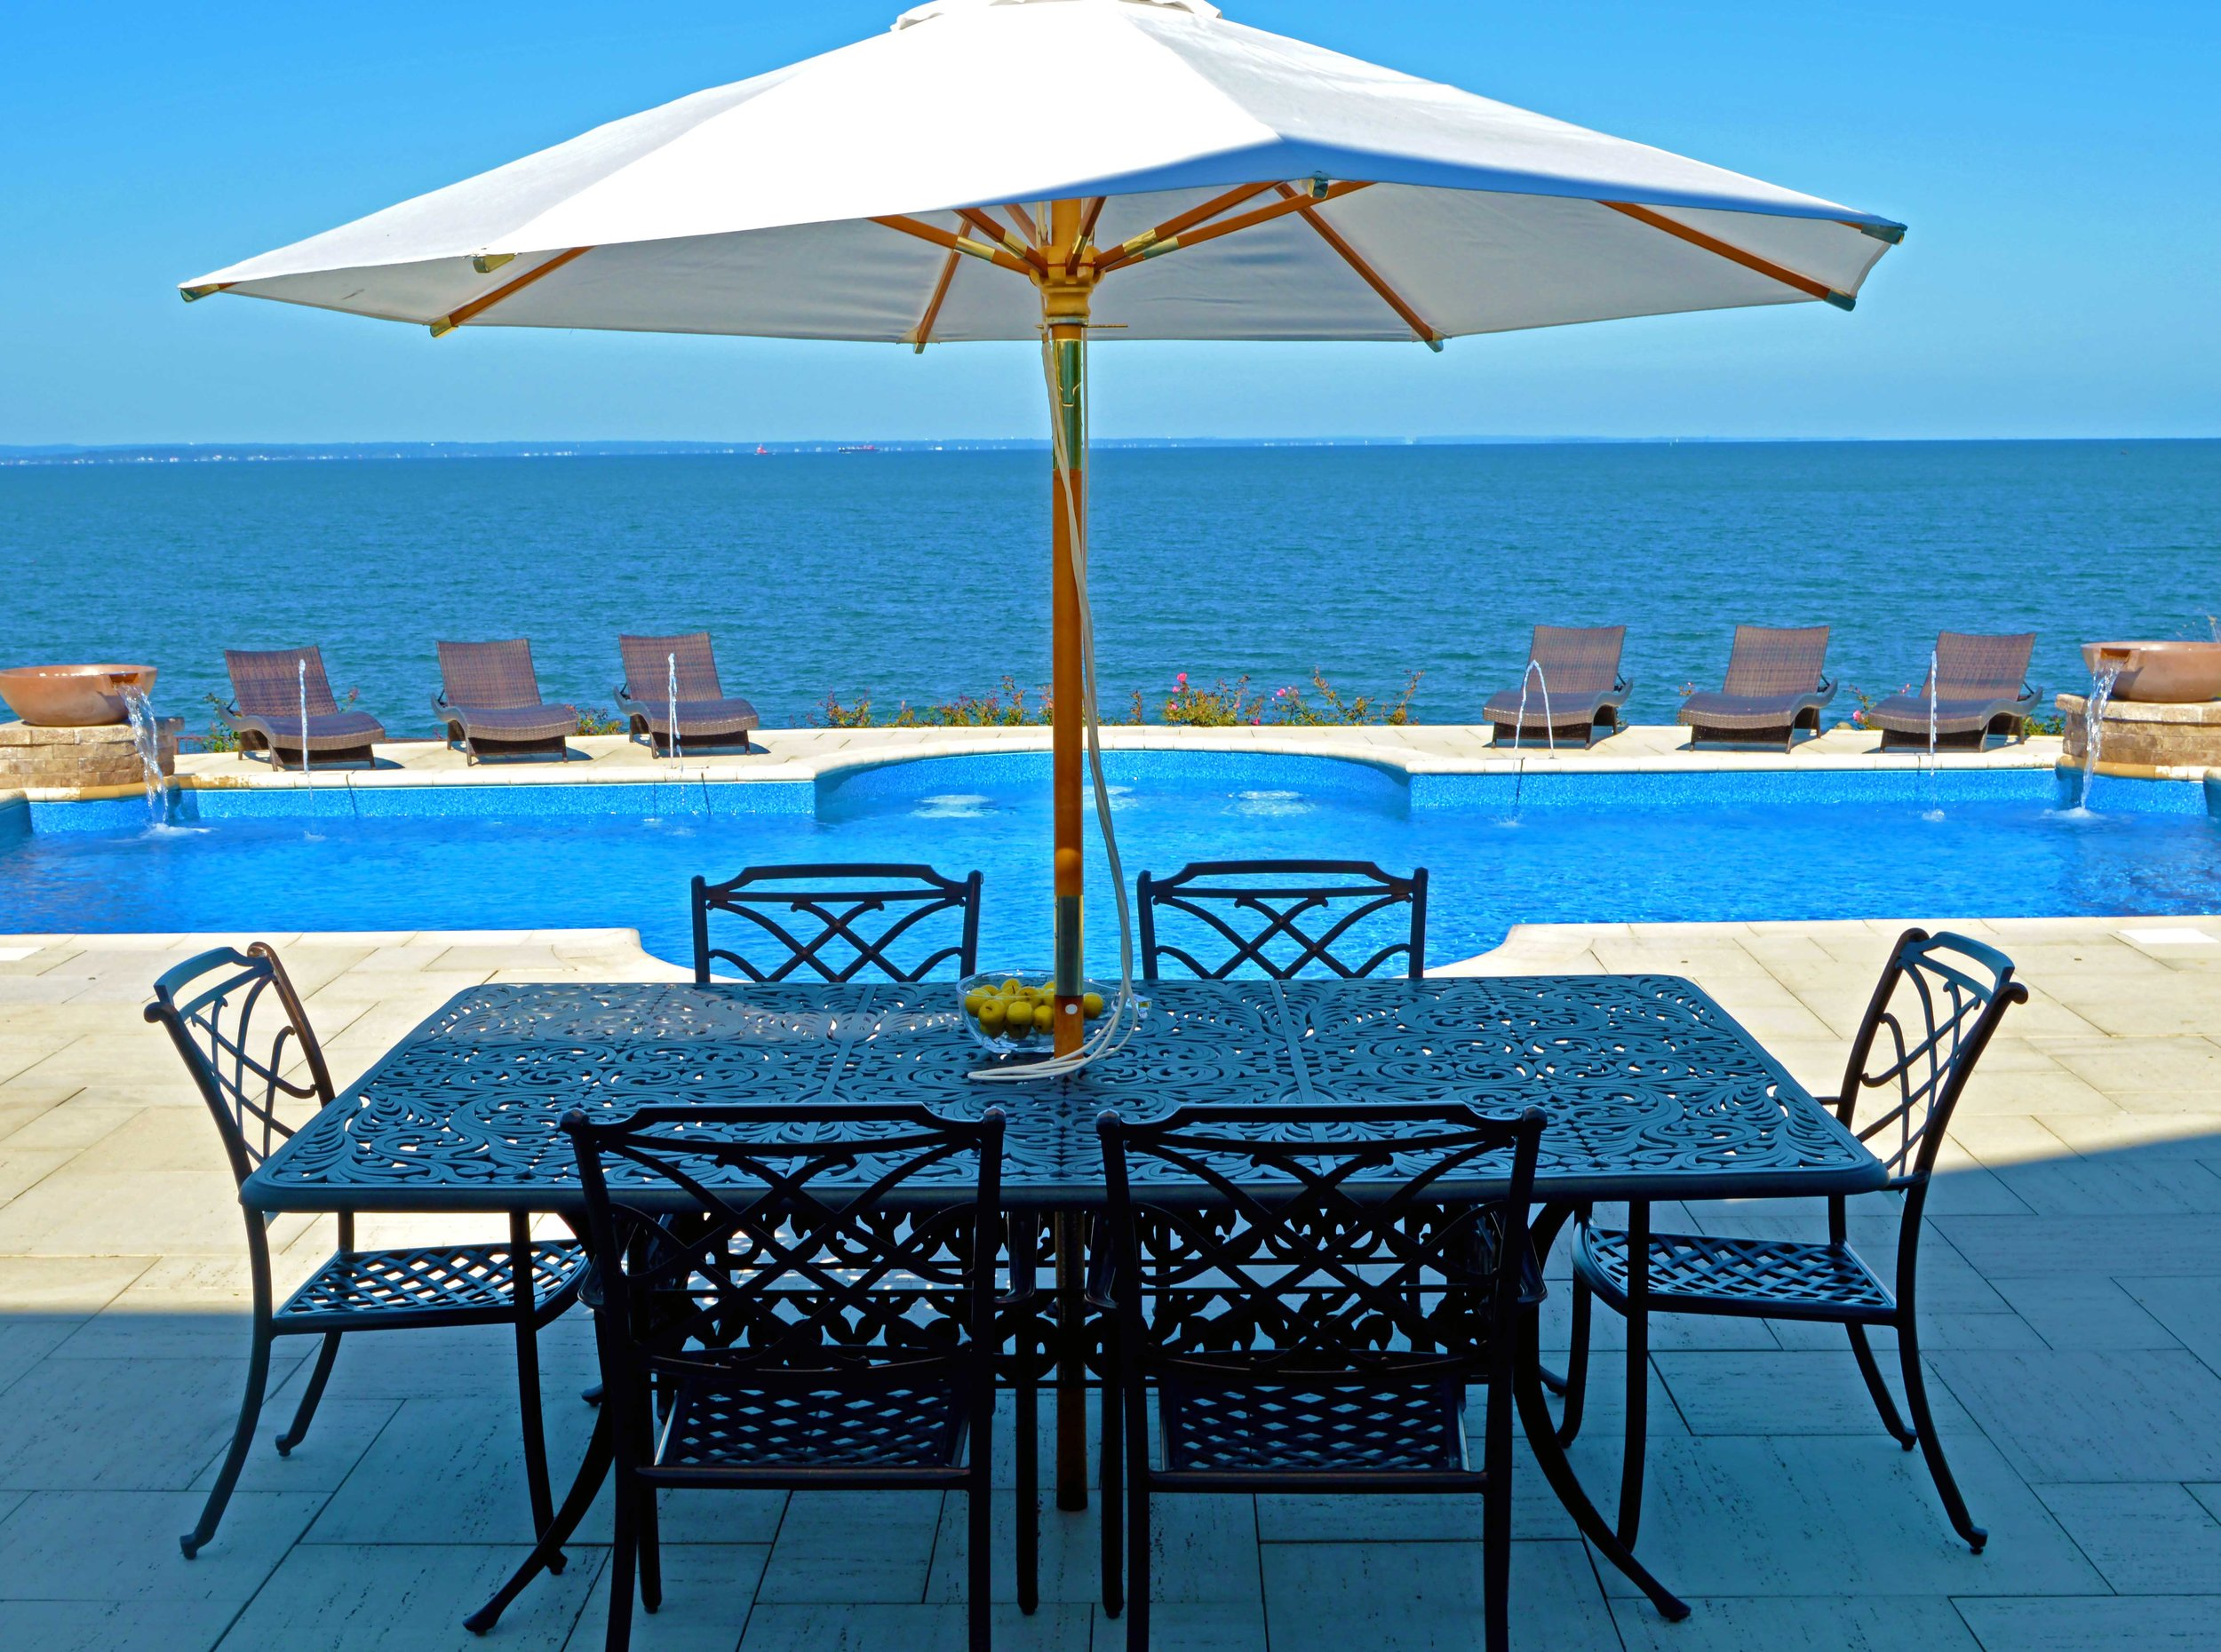 Backyard Designs for Long Island, NY Homes with Incredible Views